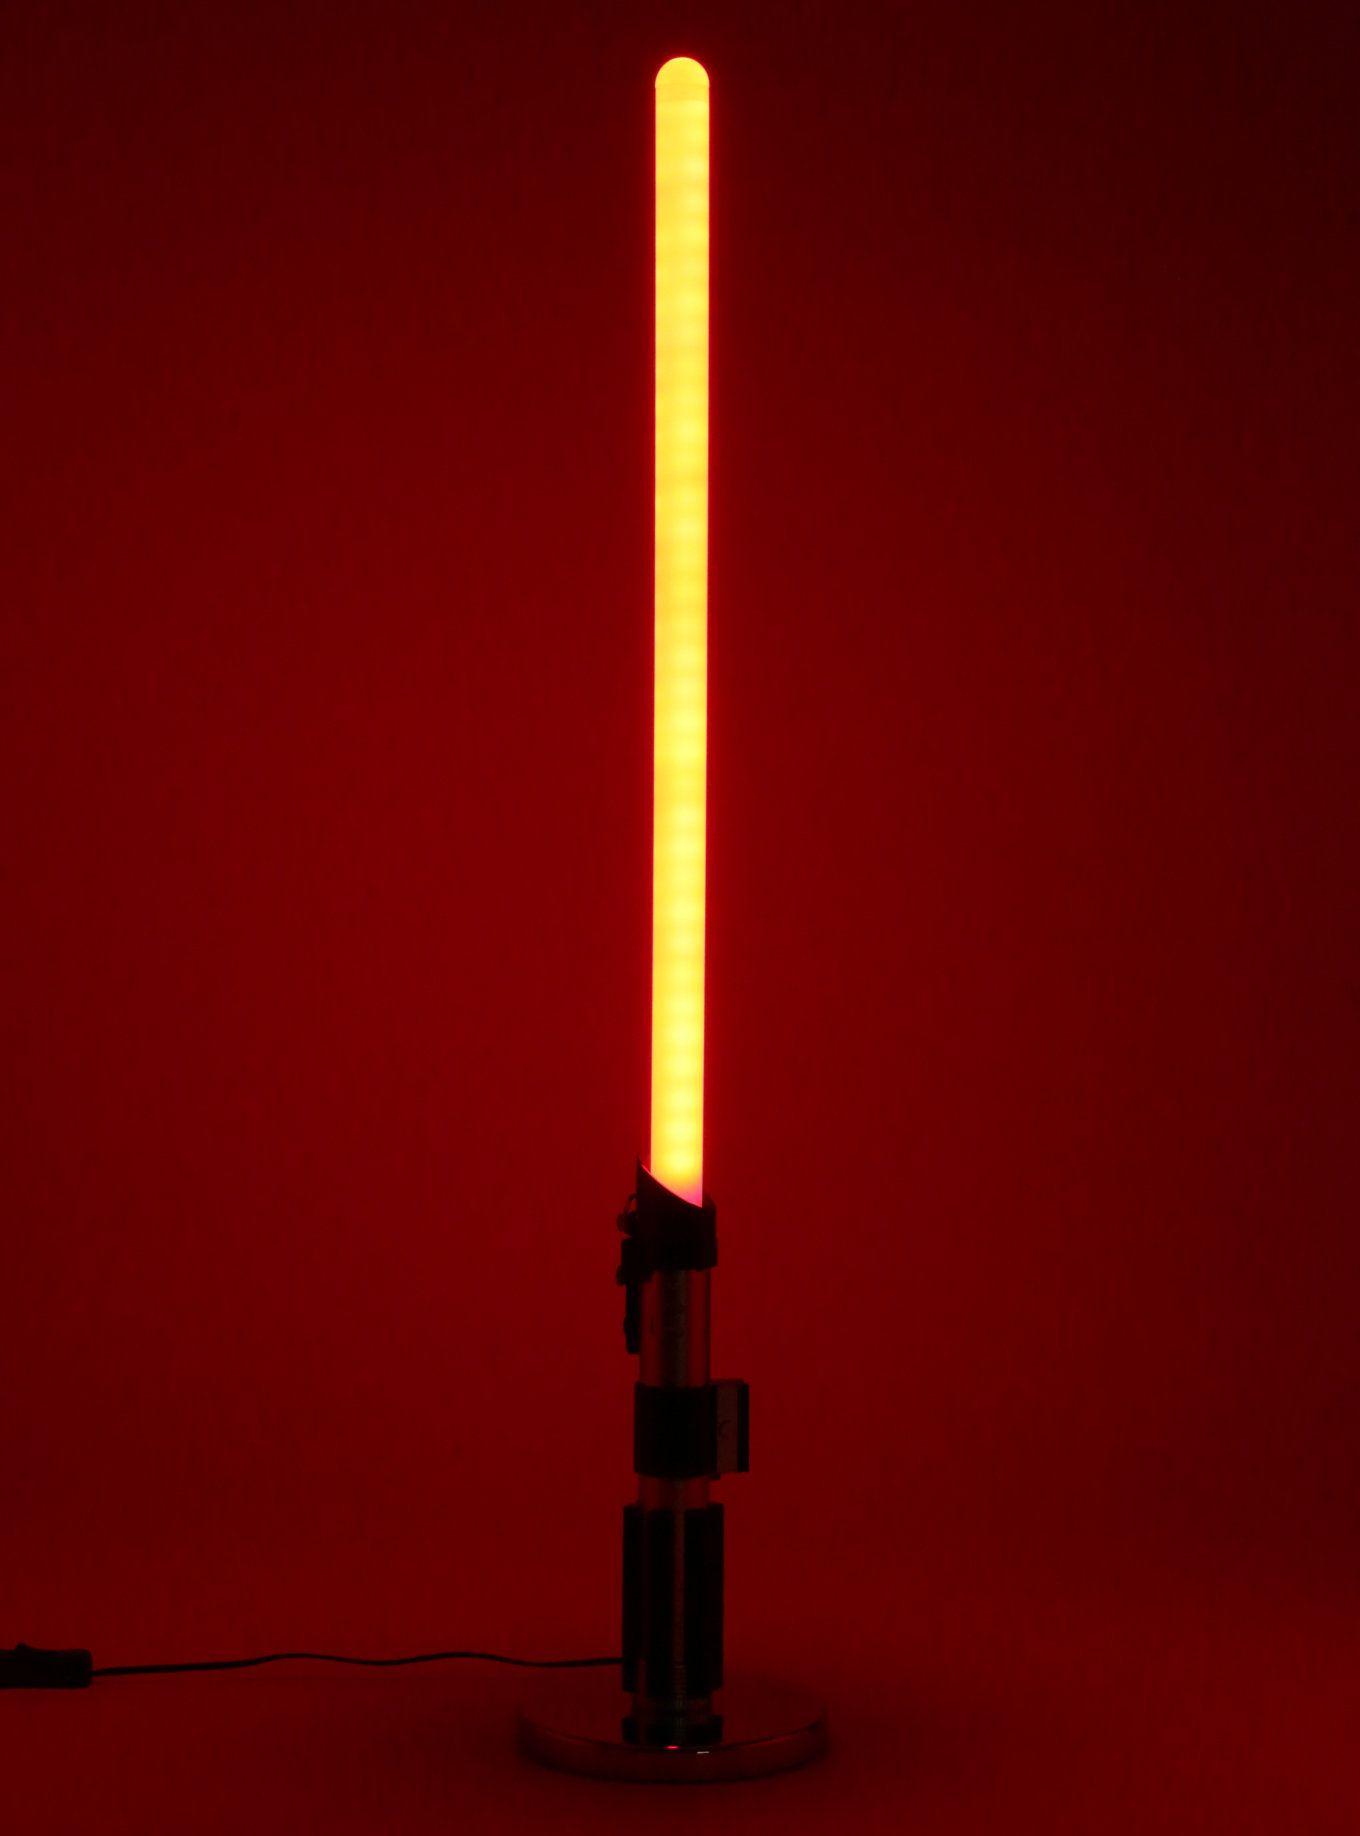 House Desk LampGraigs Vader Wars Darth Star Lightsaber Led OwXuPkiZT